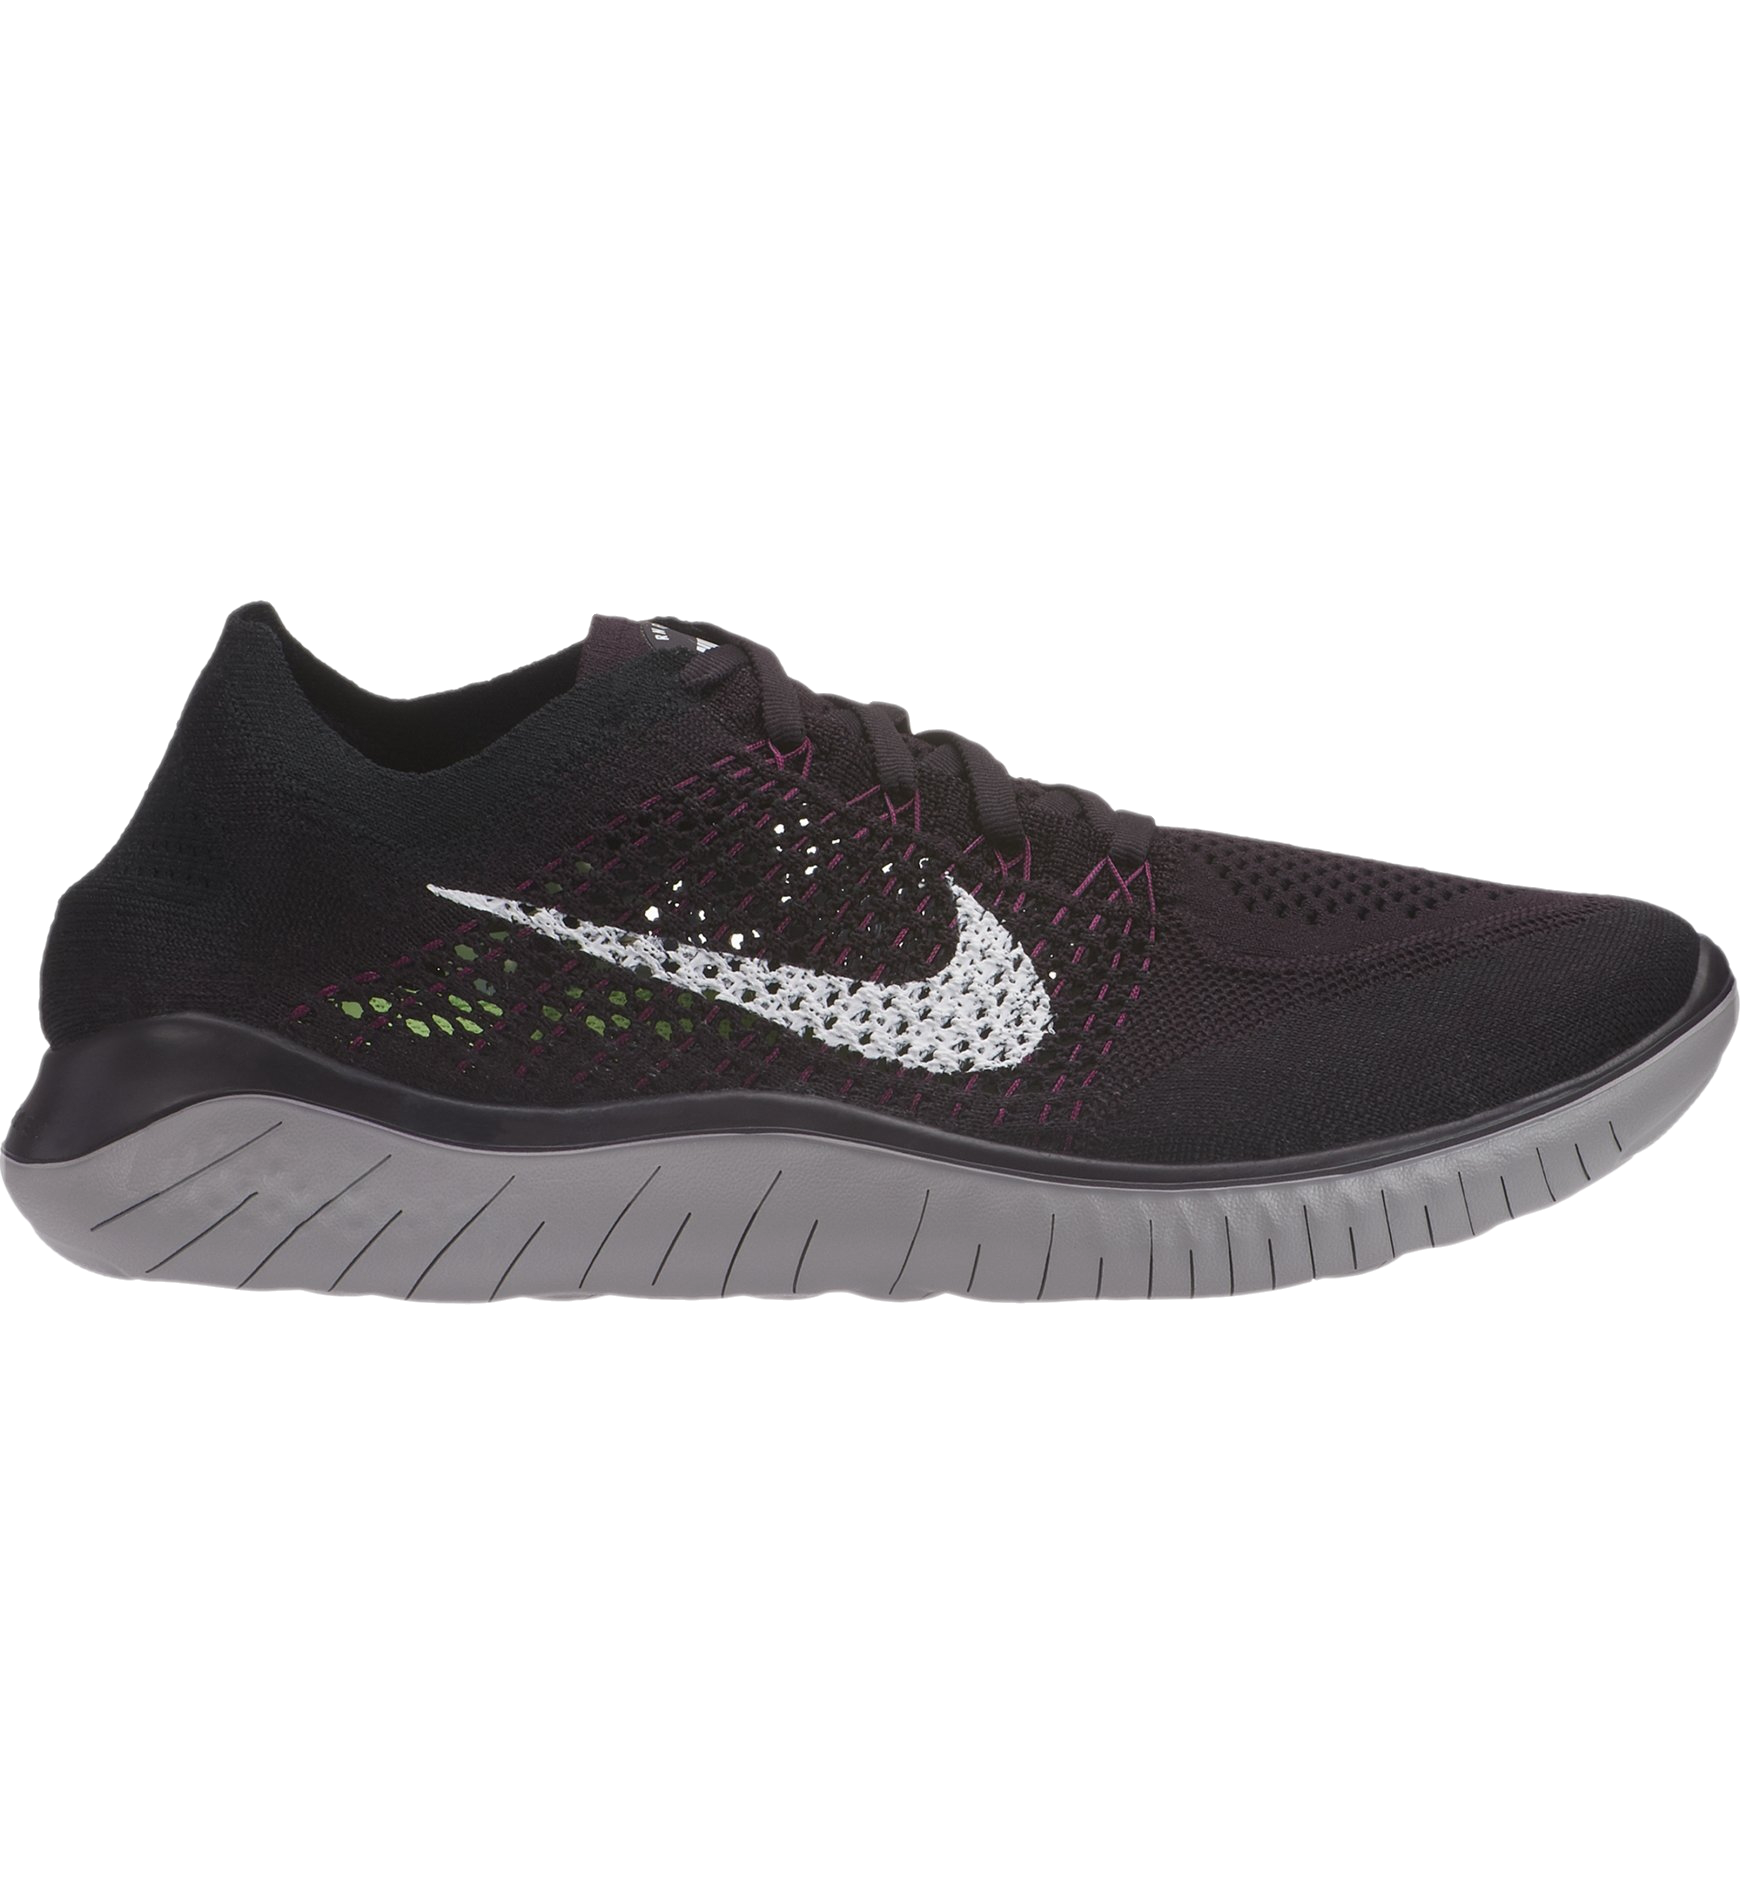 Free Run Flyknit Nike Laufschuh Natural Running Herrenmodell